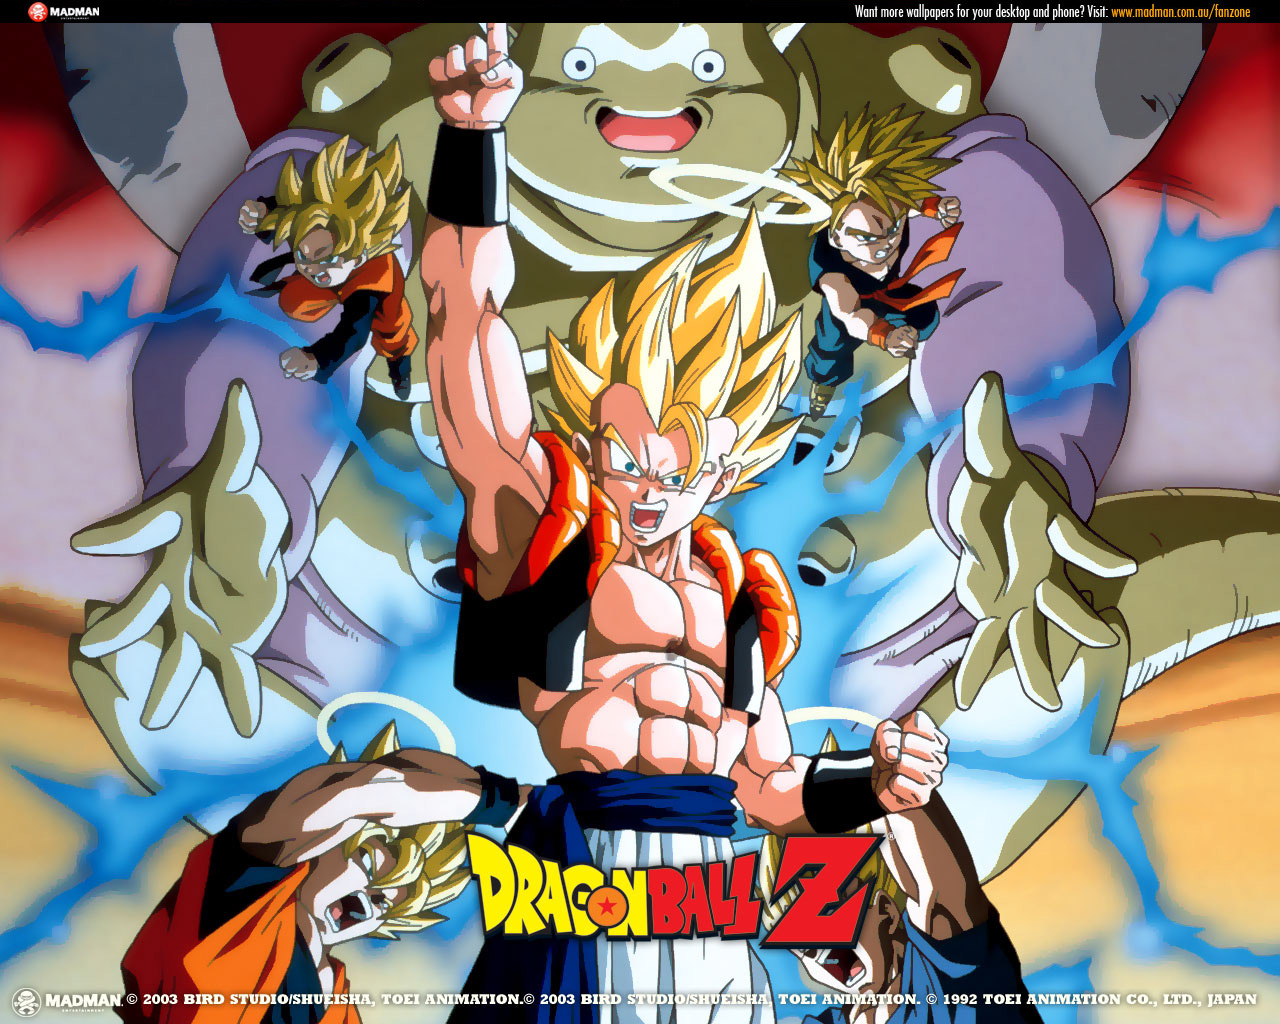 Dragon ball z episode 42 online game